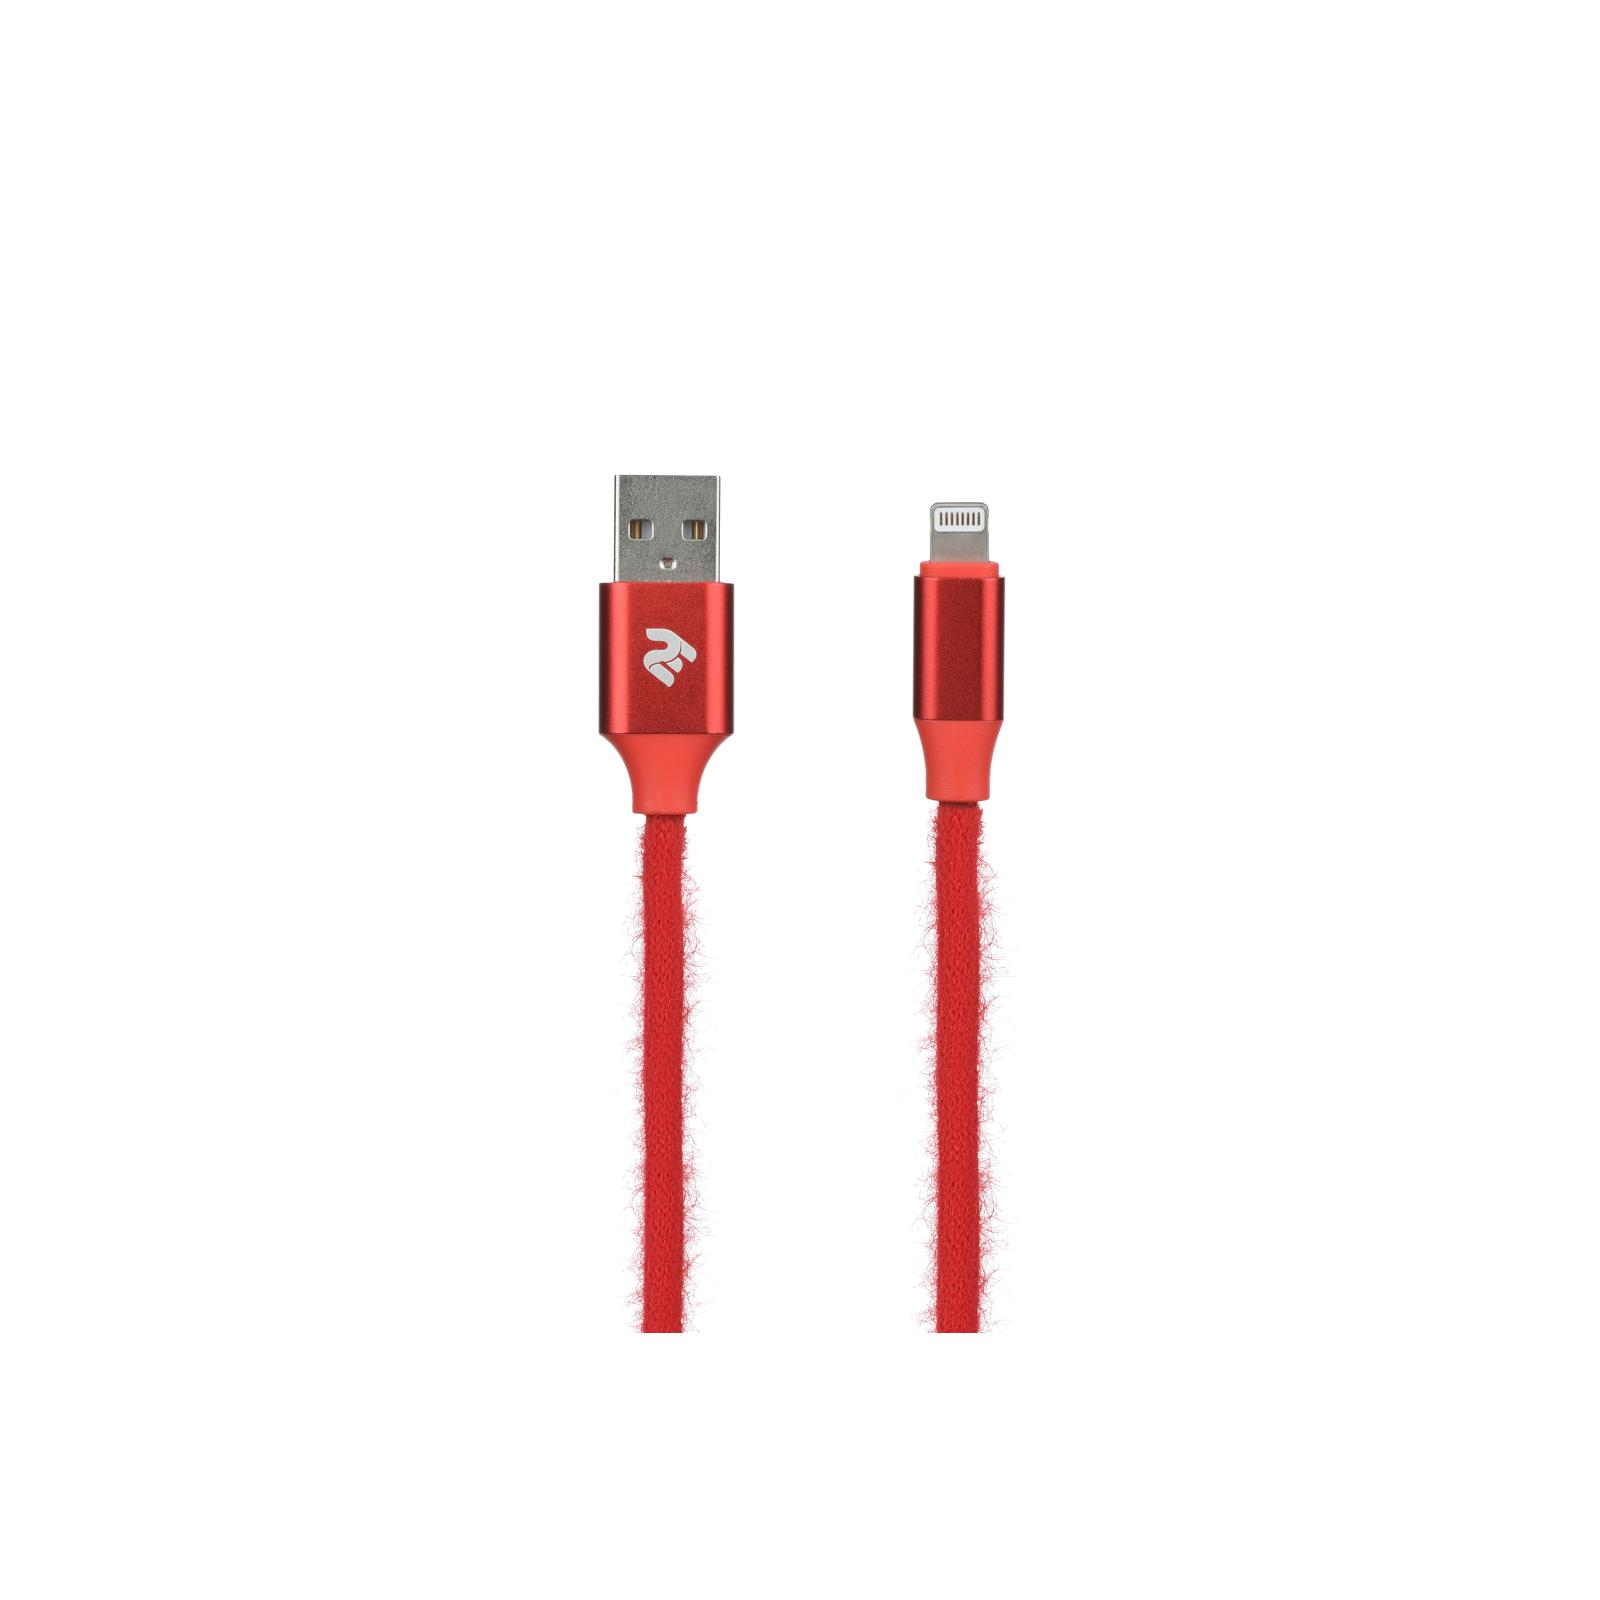 Дата кабель USB 2.0 AM to Lightning 1.0m Fur black 2E (2E-CCLAC-BLACK)